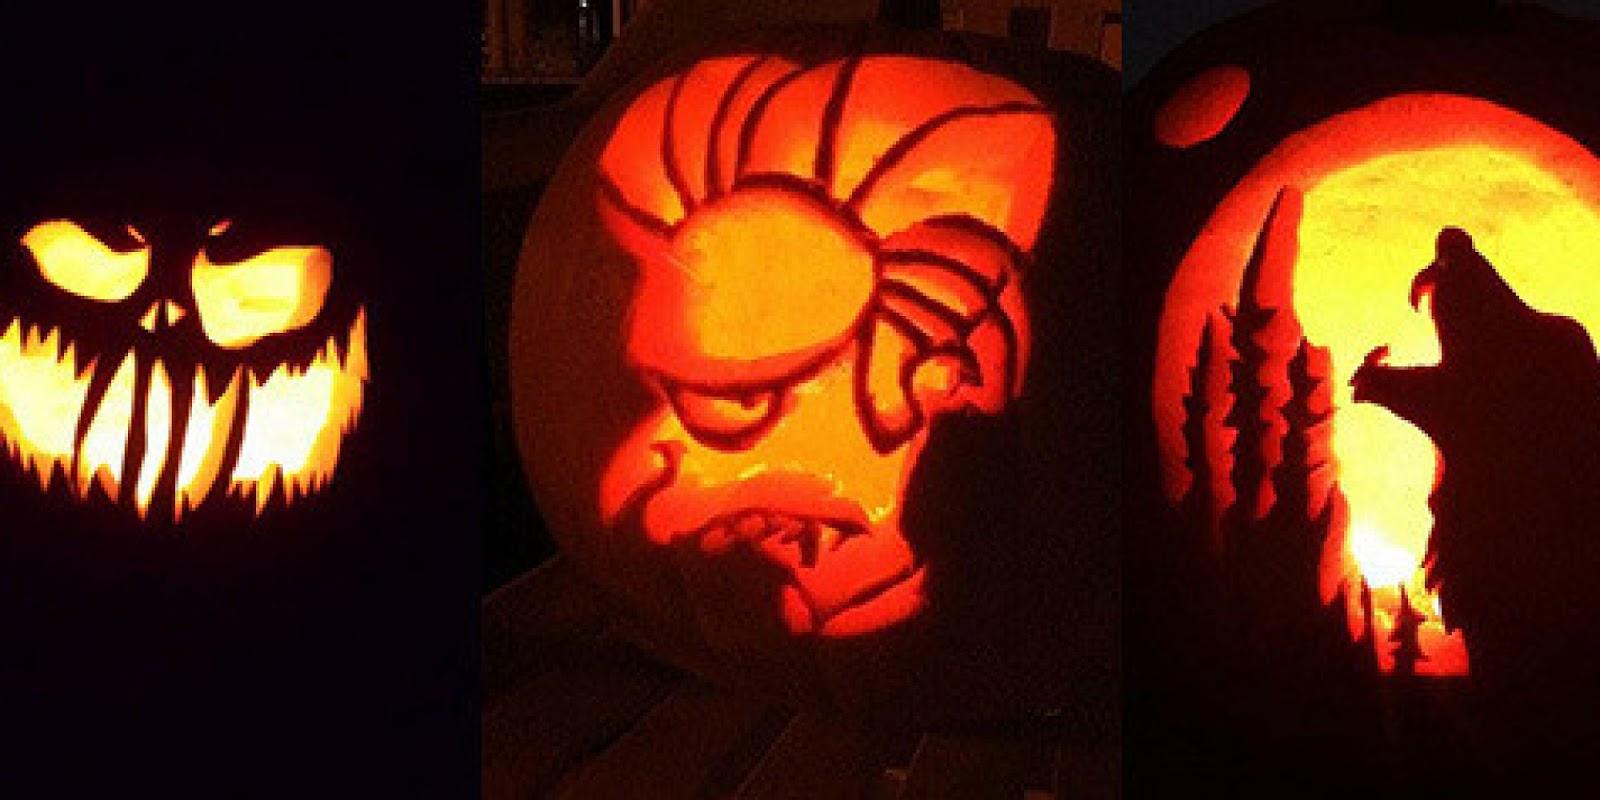 50+ Top Best Spooky Pumpkin Carving Ideas 2016 For Happy Halloween ...